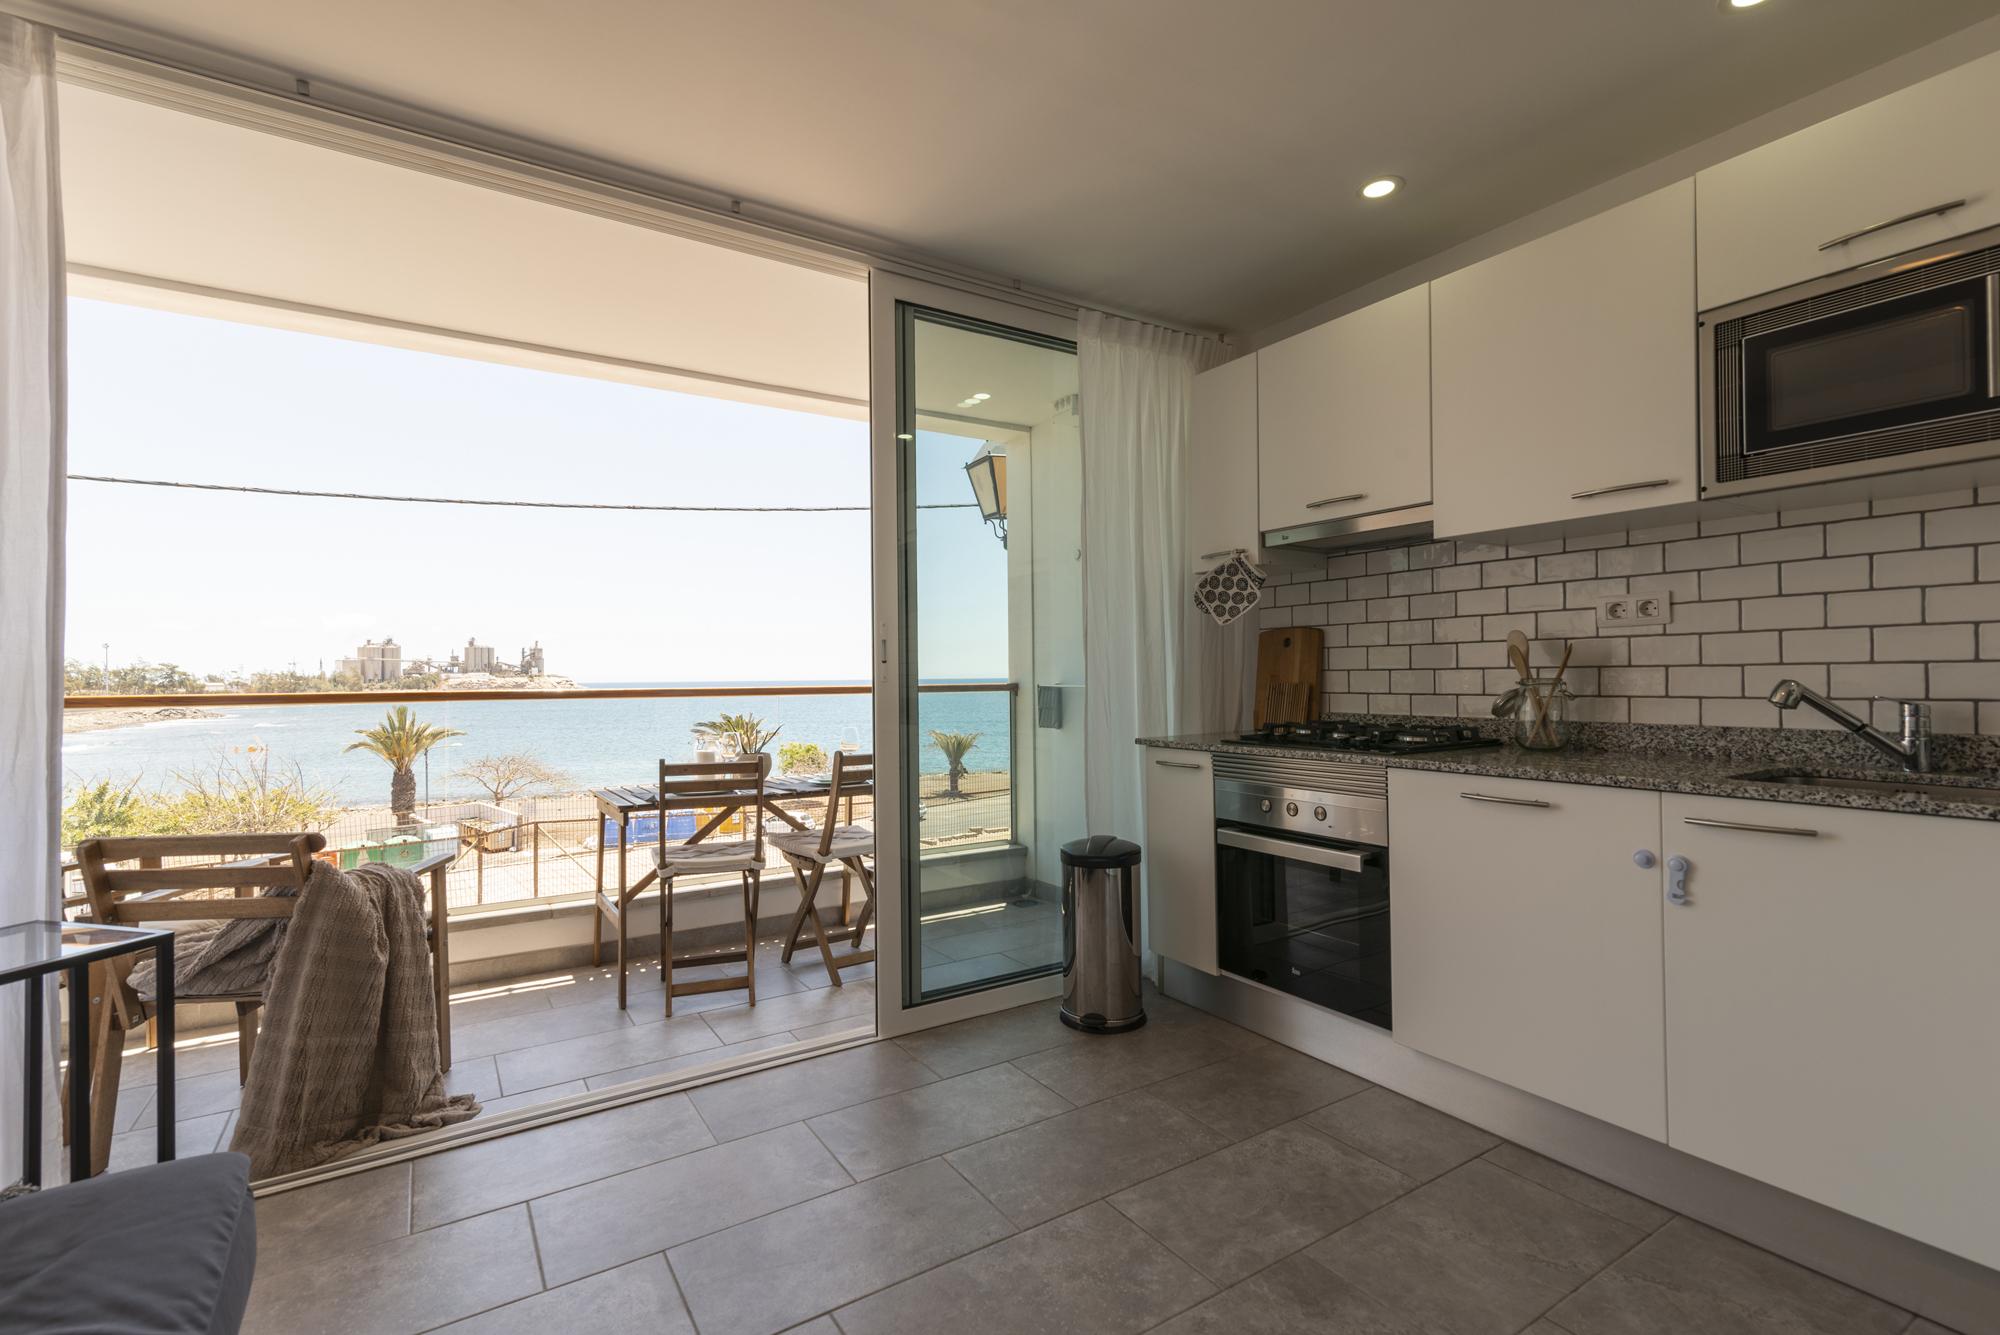 The Beach House, Arguineguín - Erster Stock ab 327.5 € pP